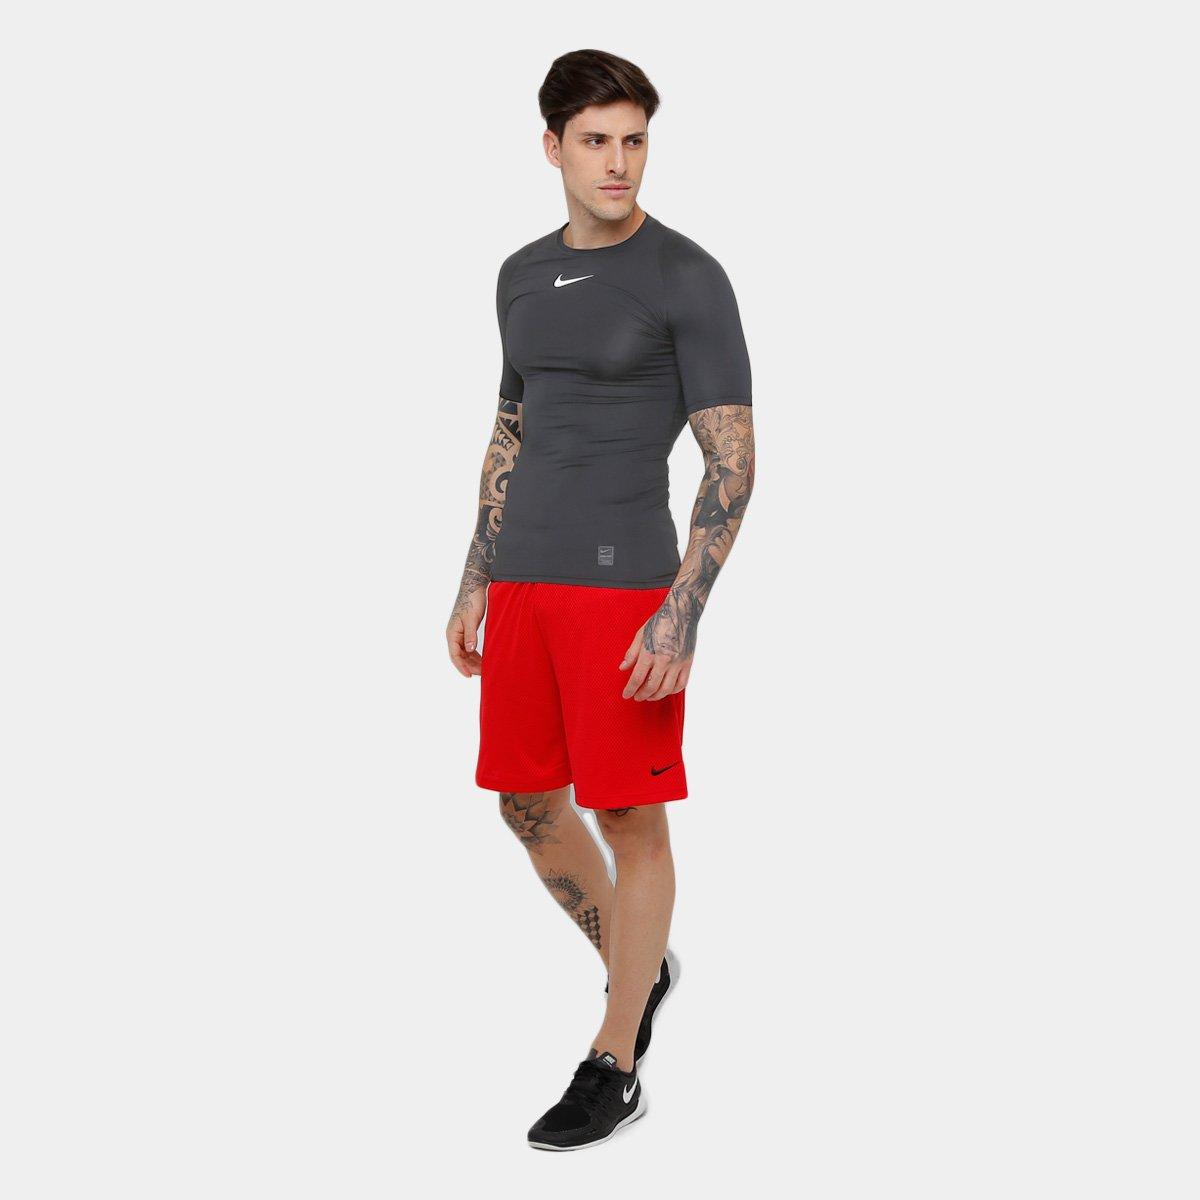 2a0224ba1e2a0 Camiseta Compressão Nike Pro Masculina - Shopping TudoAzul